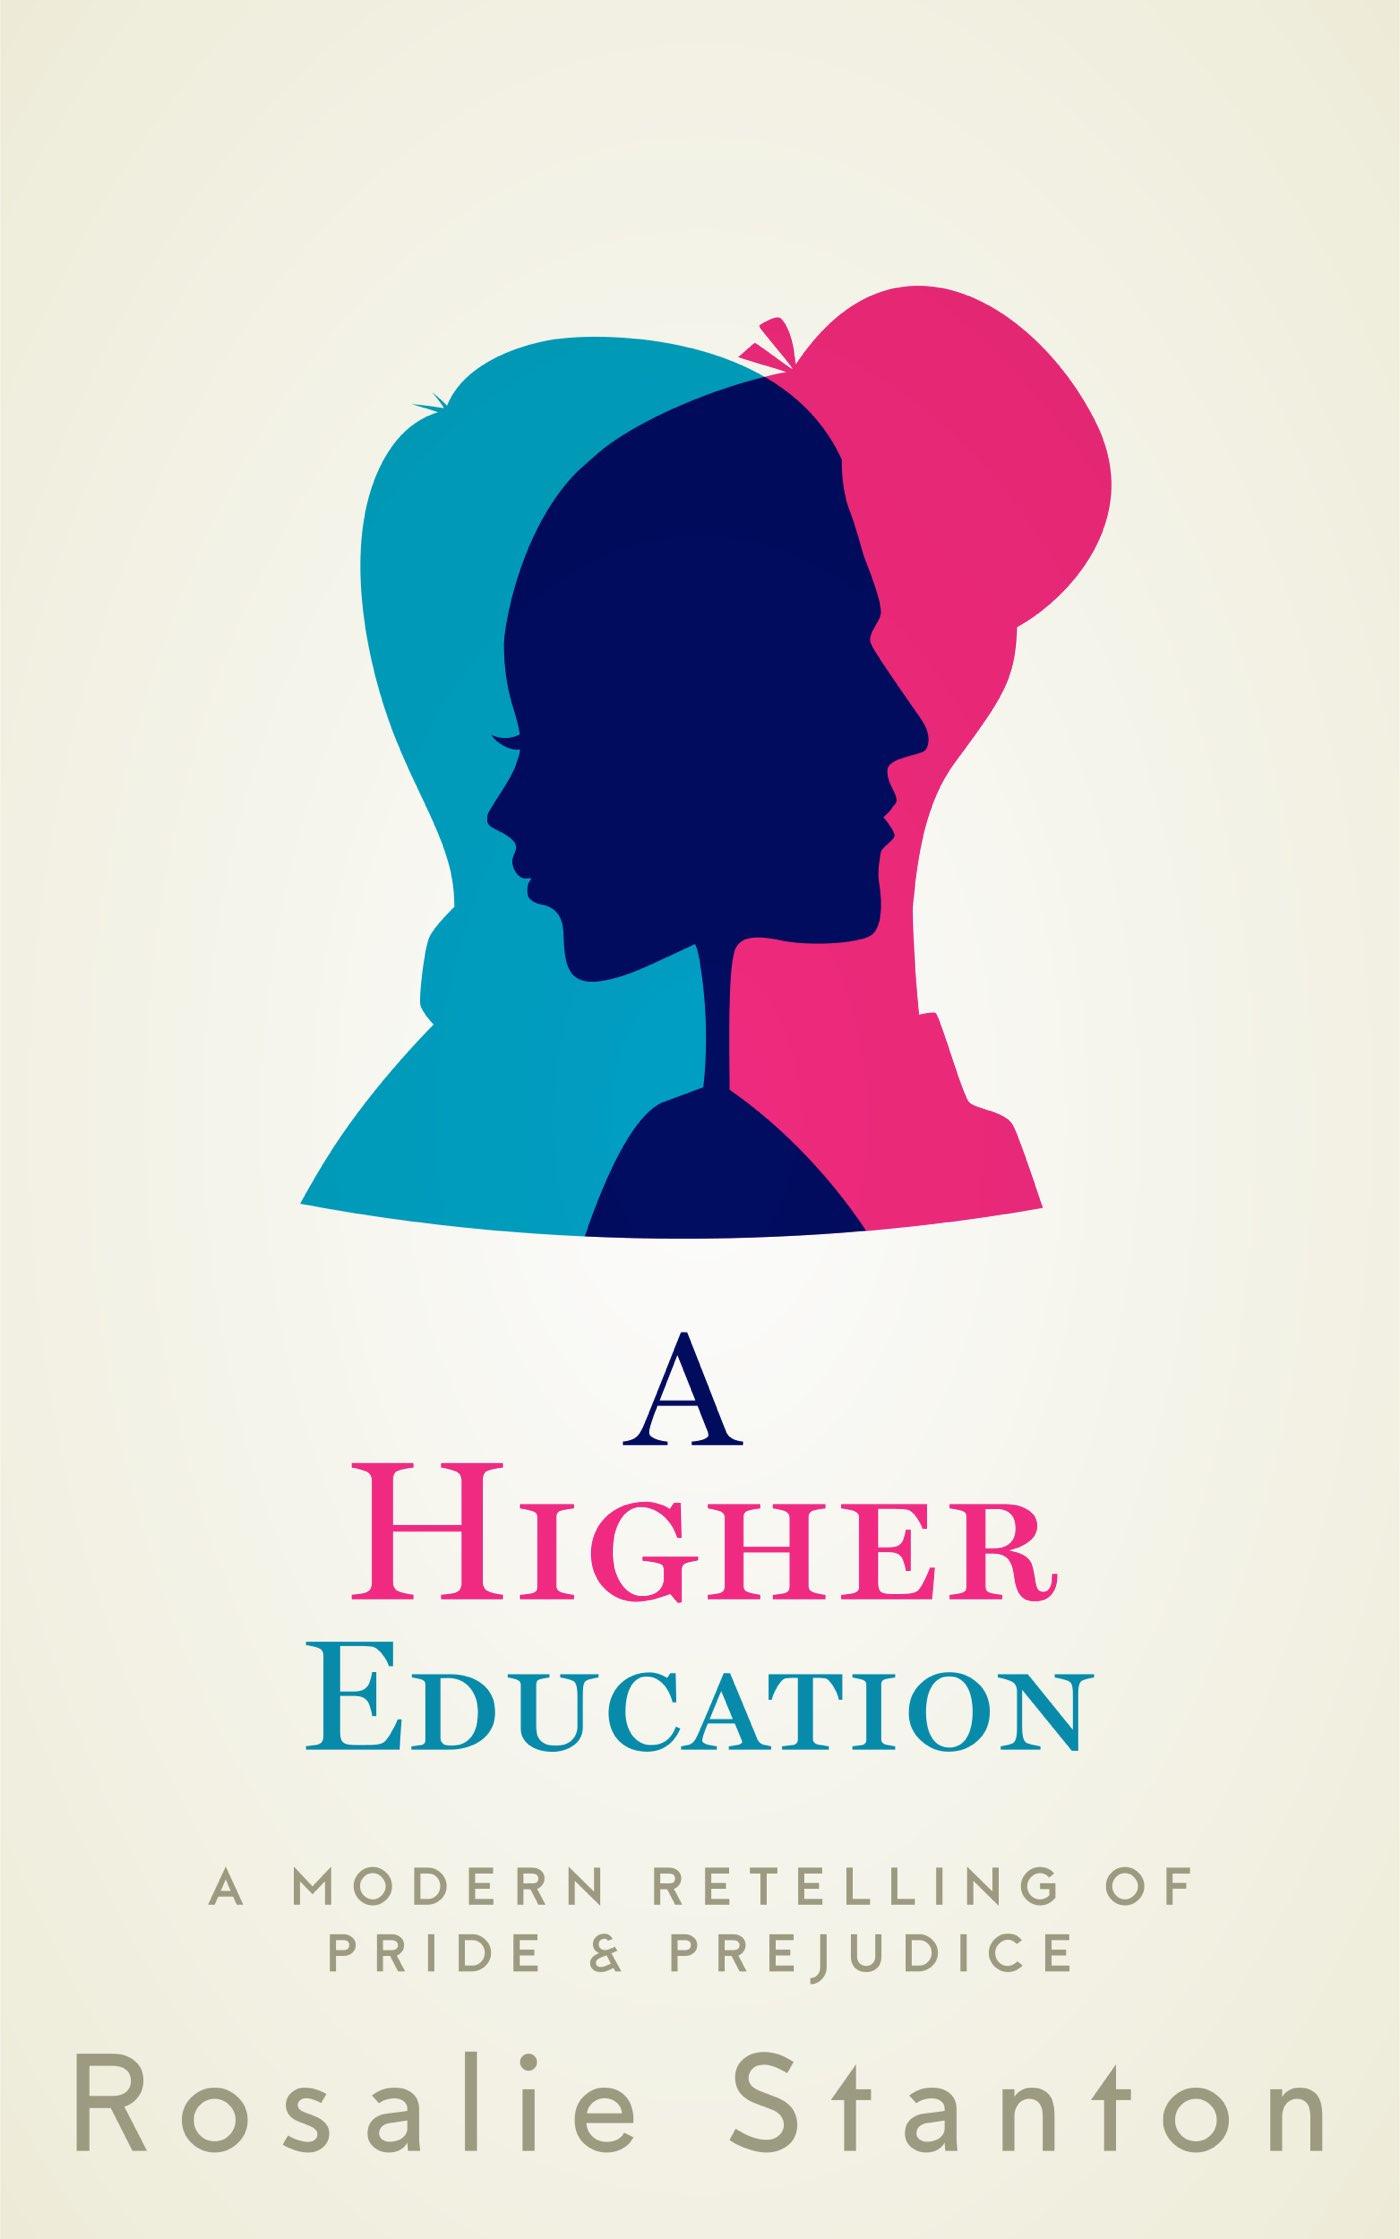 A-Higher-Education-Generic.jpg